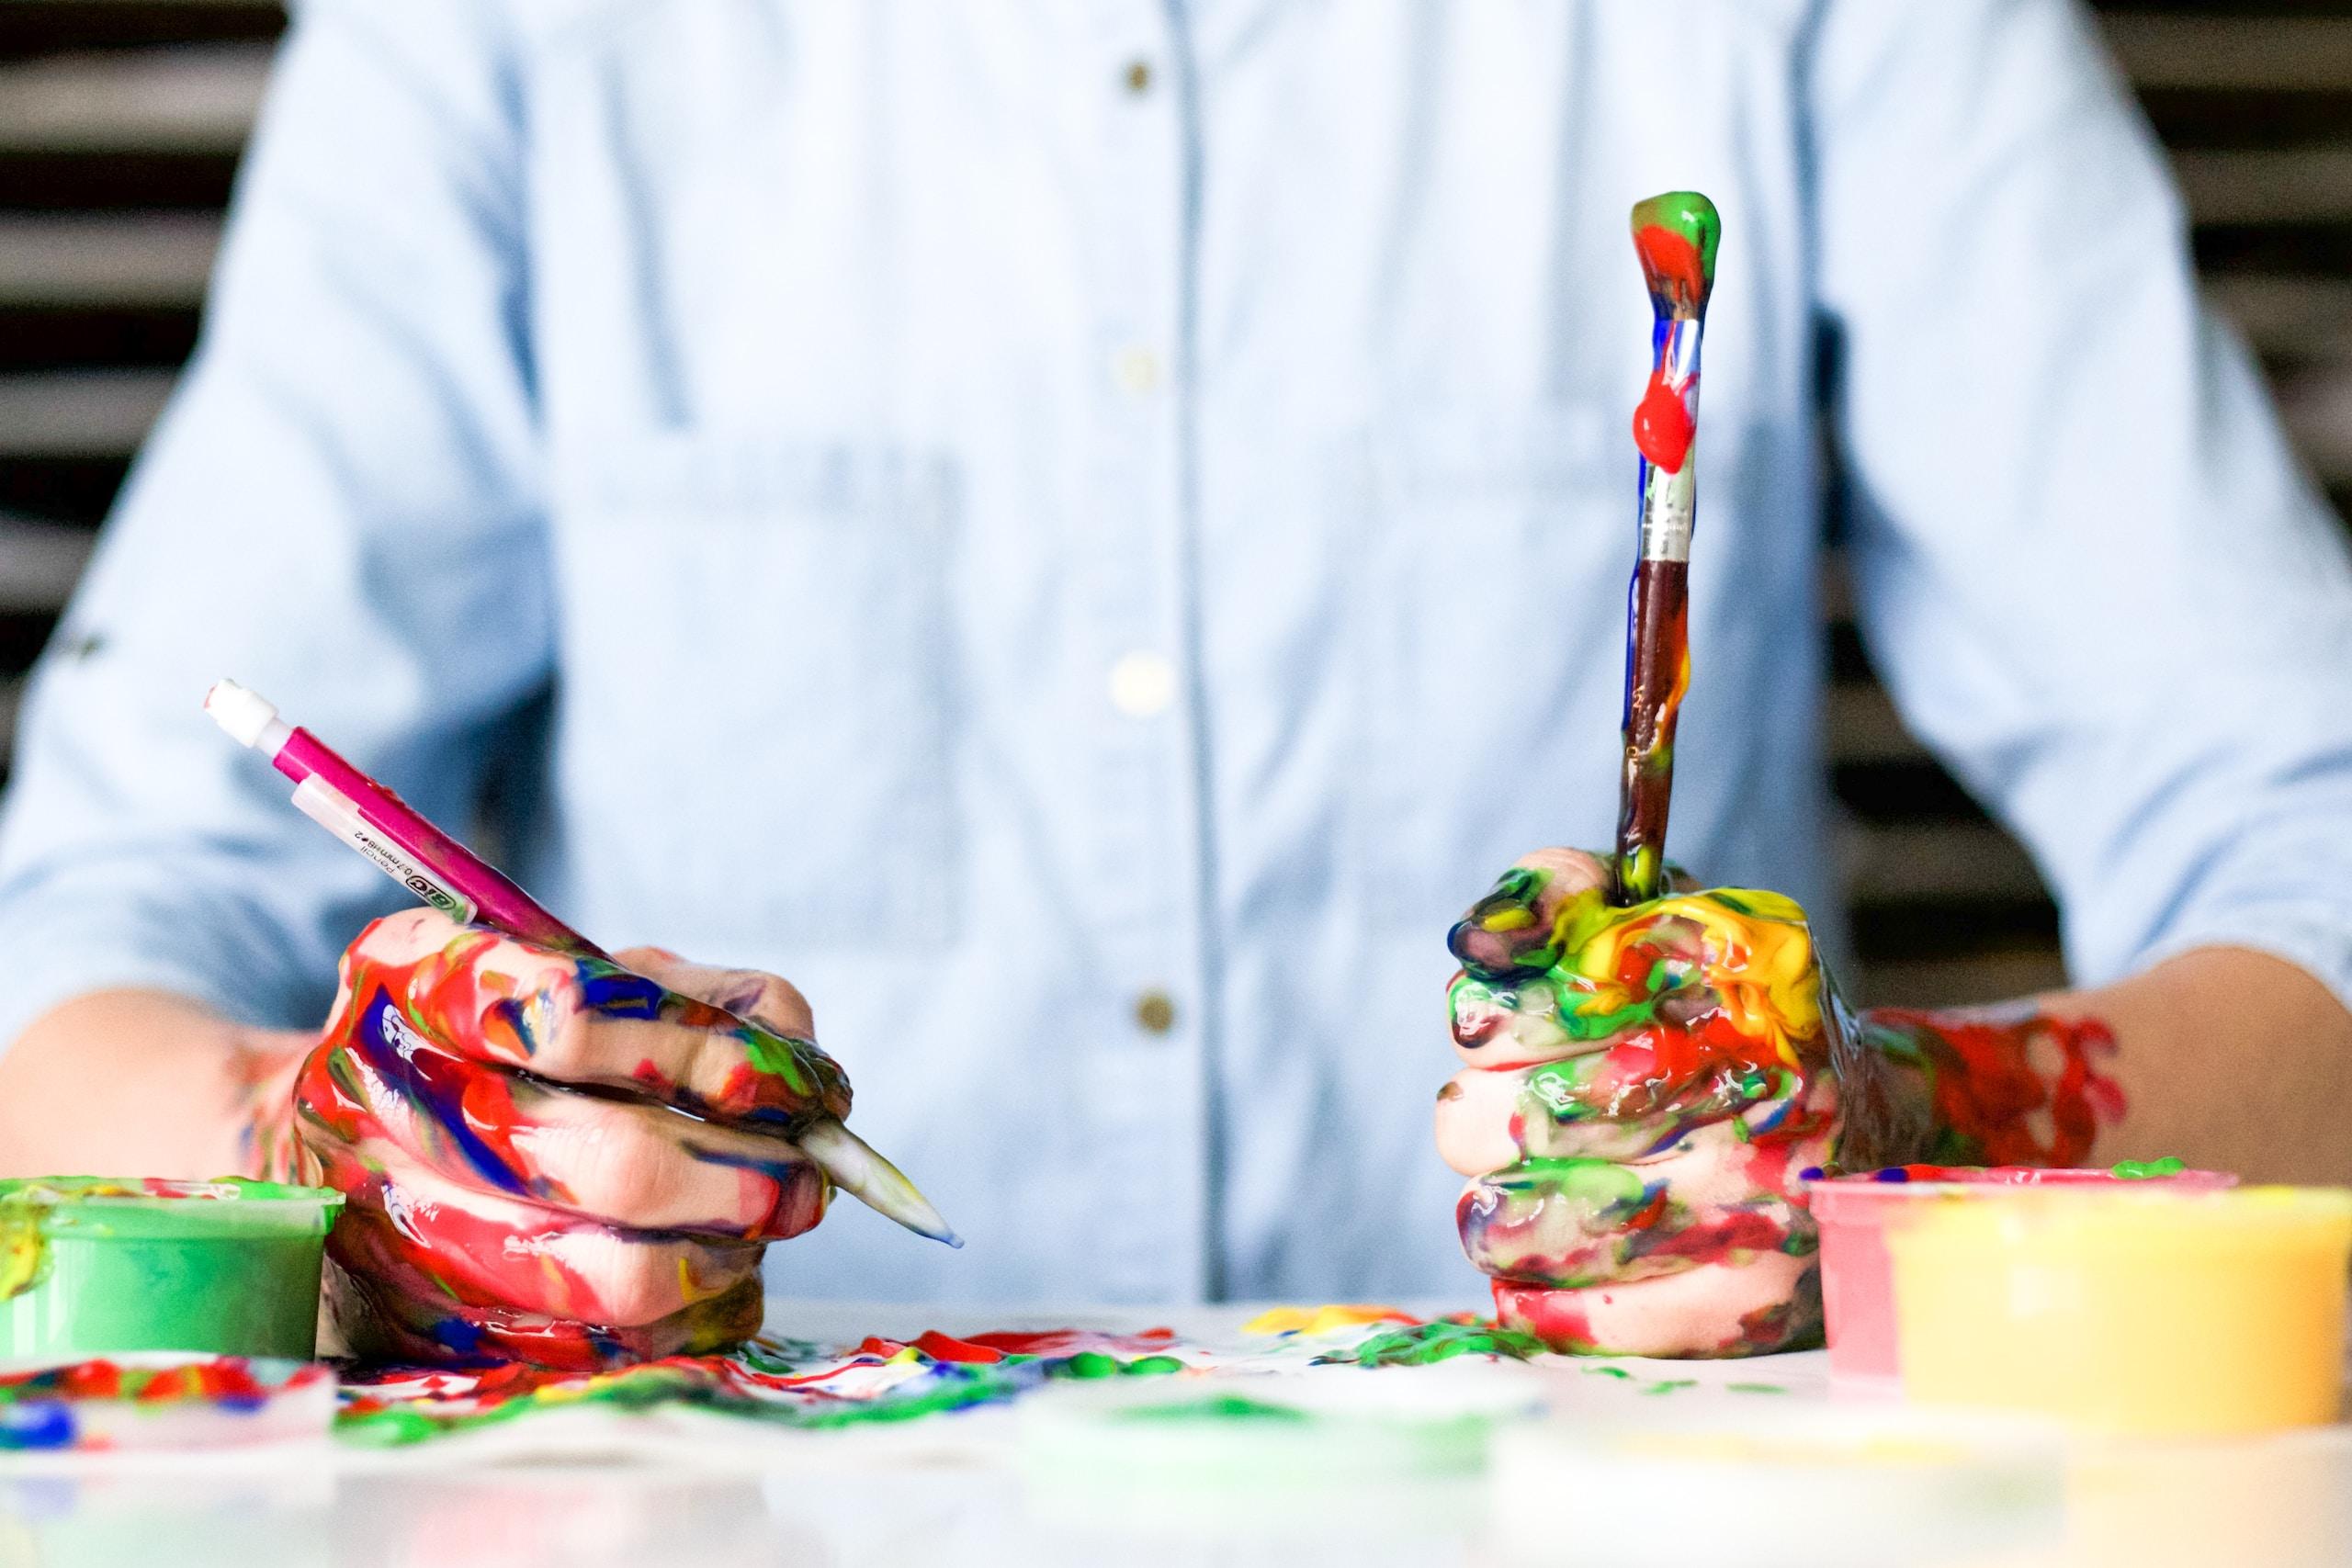 Adobe 調查:年青創世代認為創意頂峰年齡平均為 23 歲